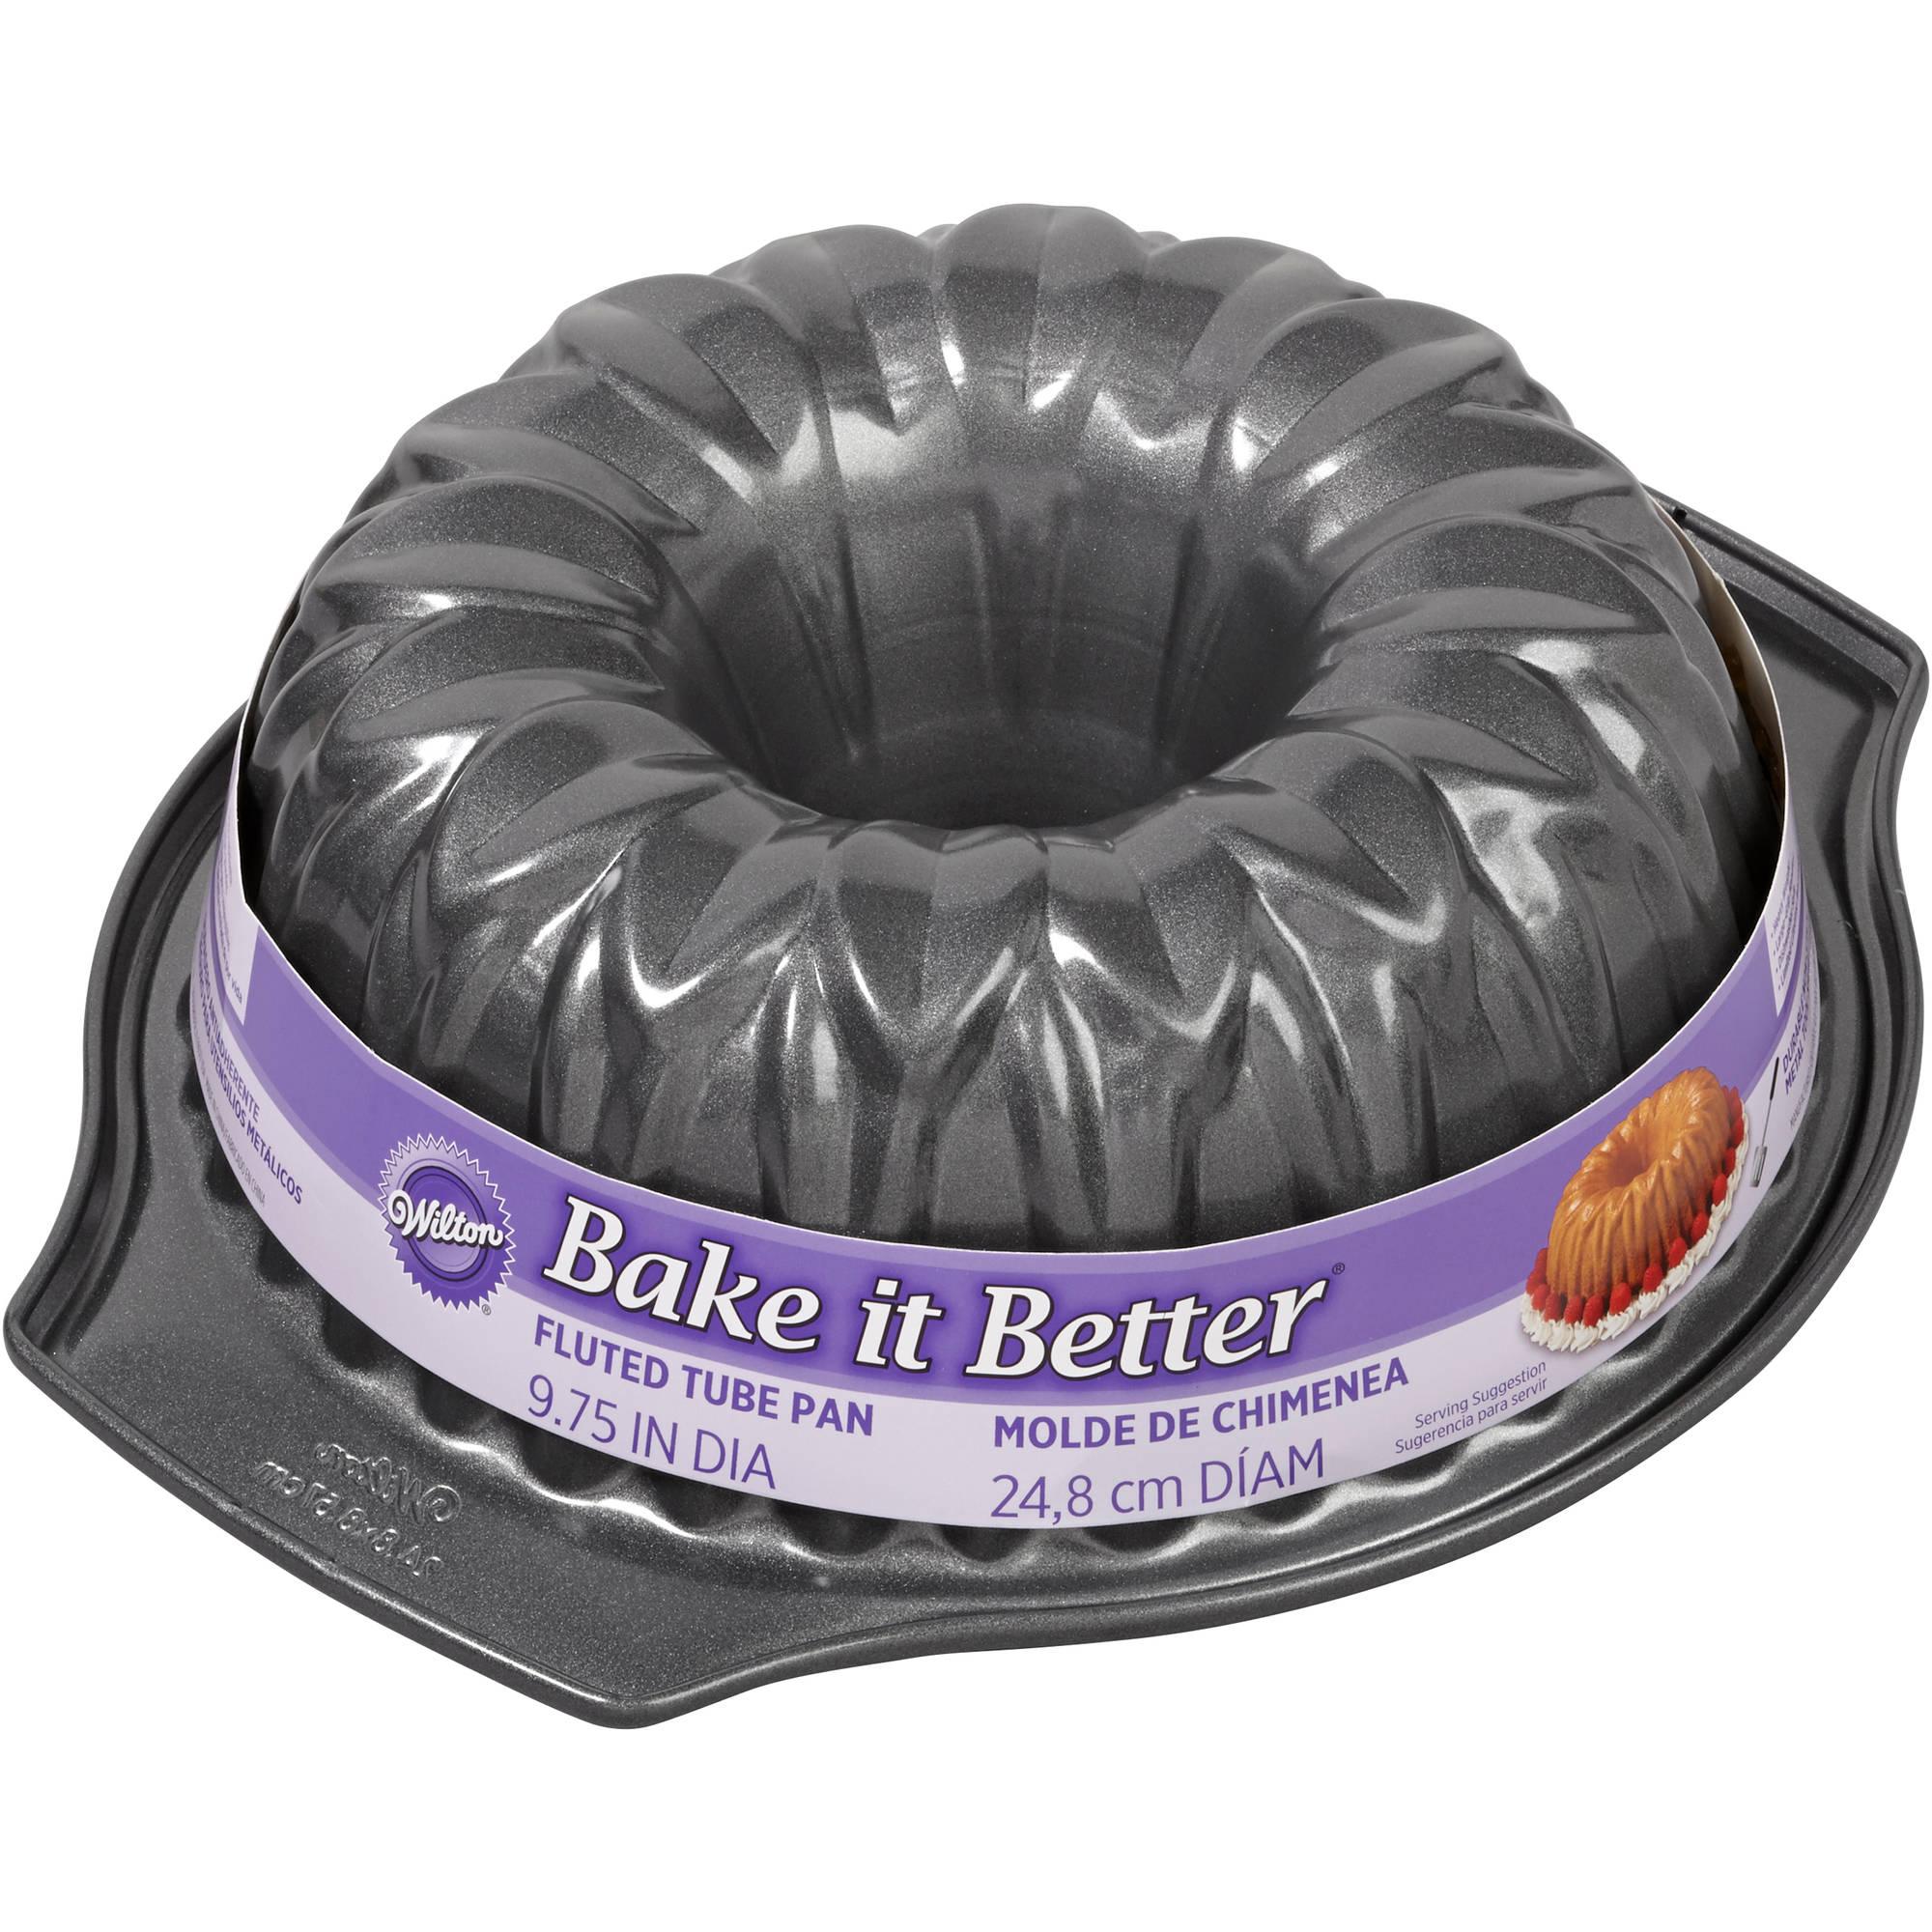 Bundt Cake Walmart